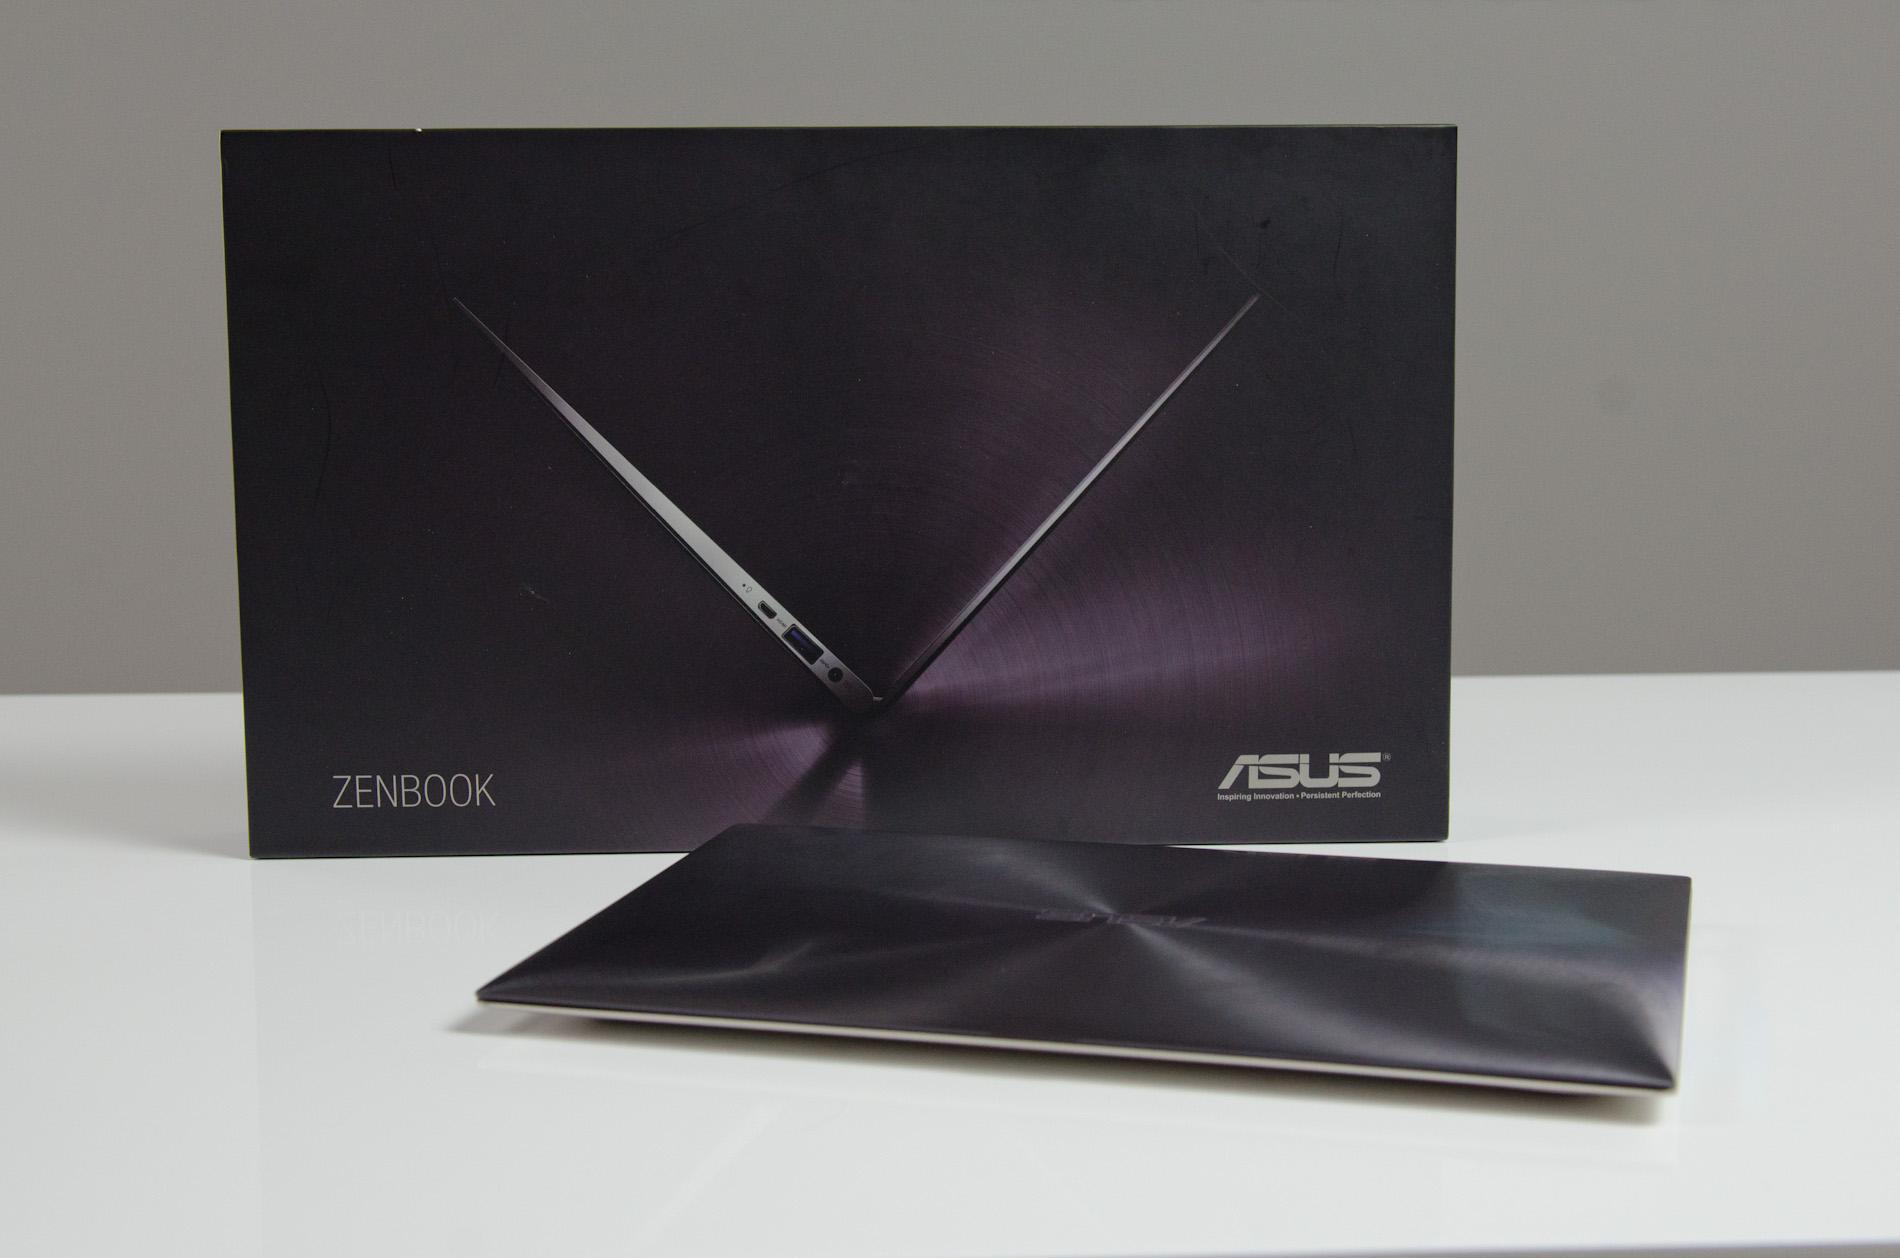 ASUS Zenbook UX21 Review 1900x1258